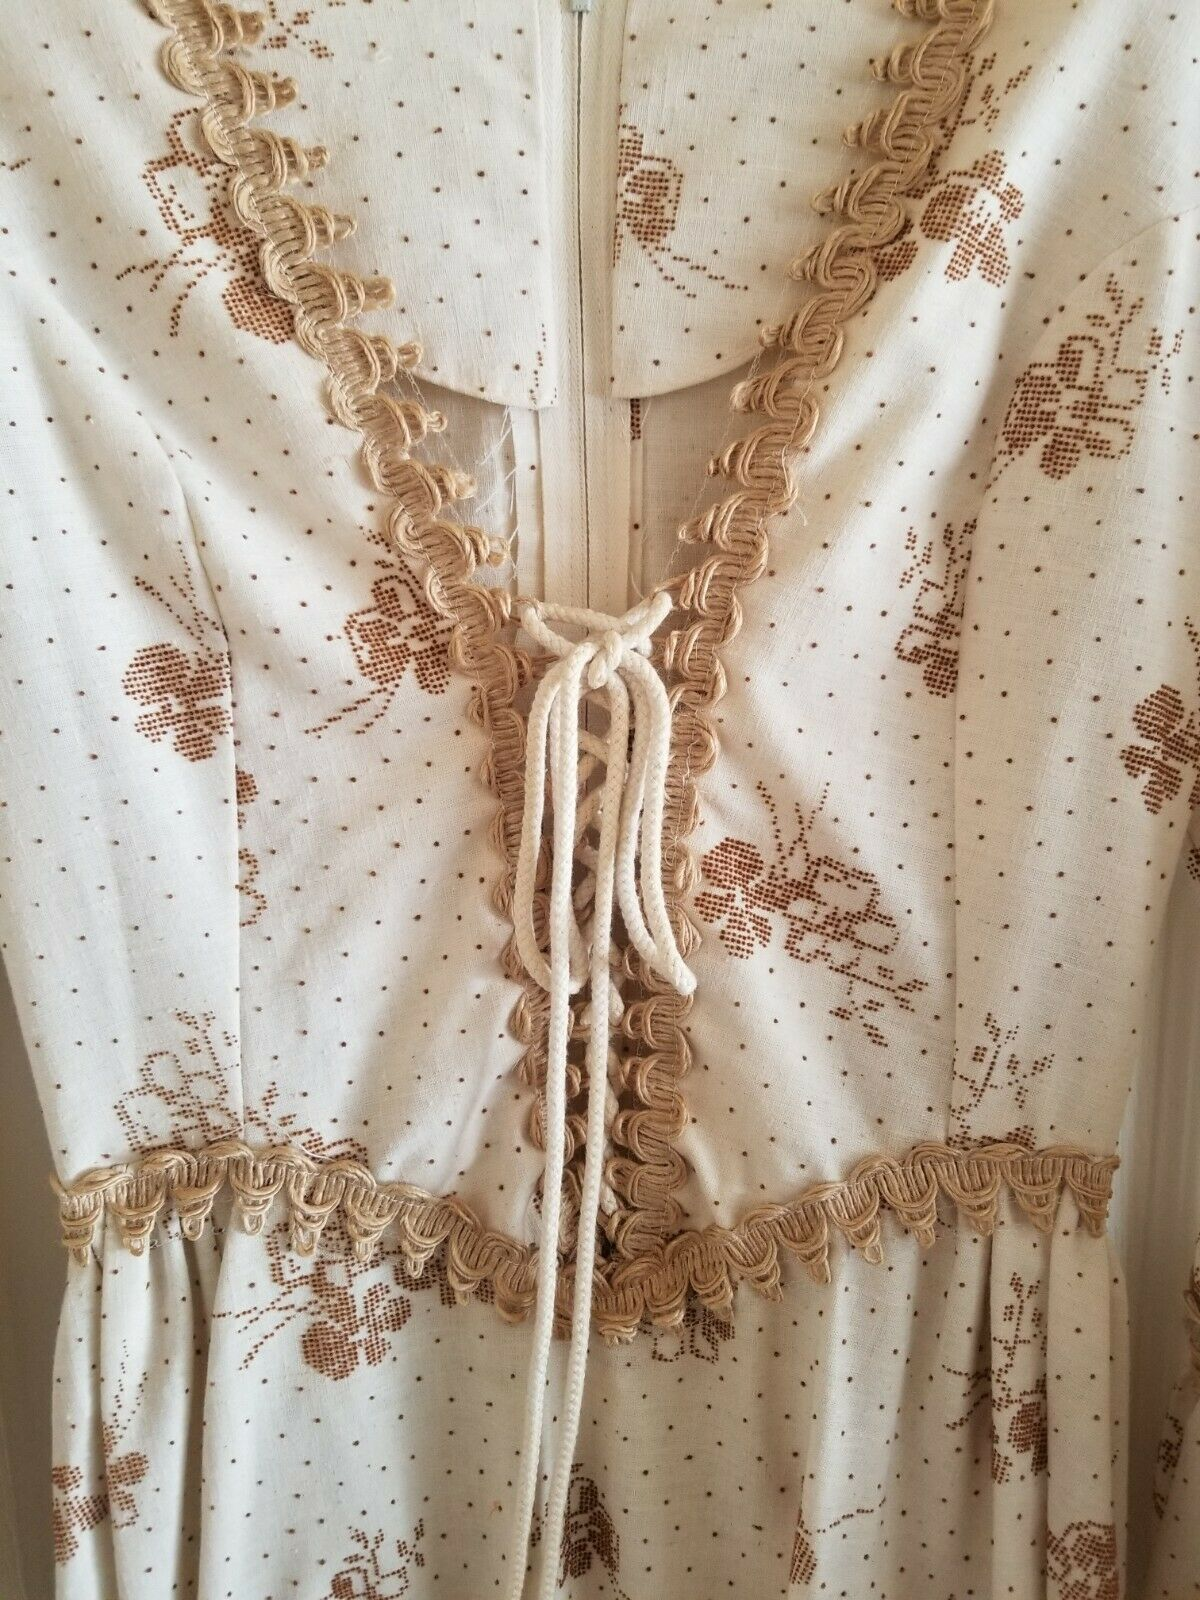 Gunne Sax Renaissance Dress - image 2